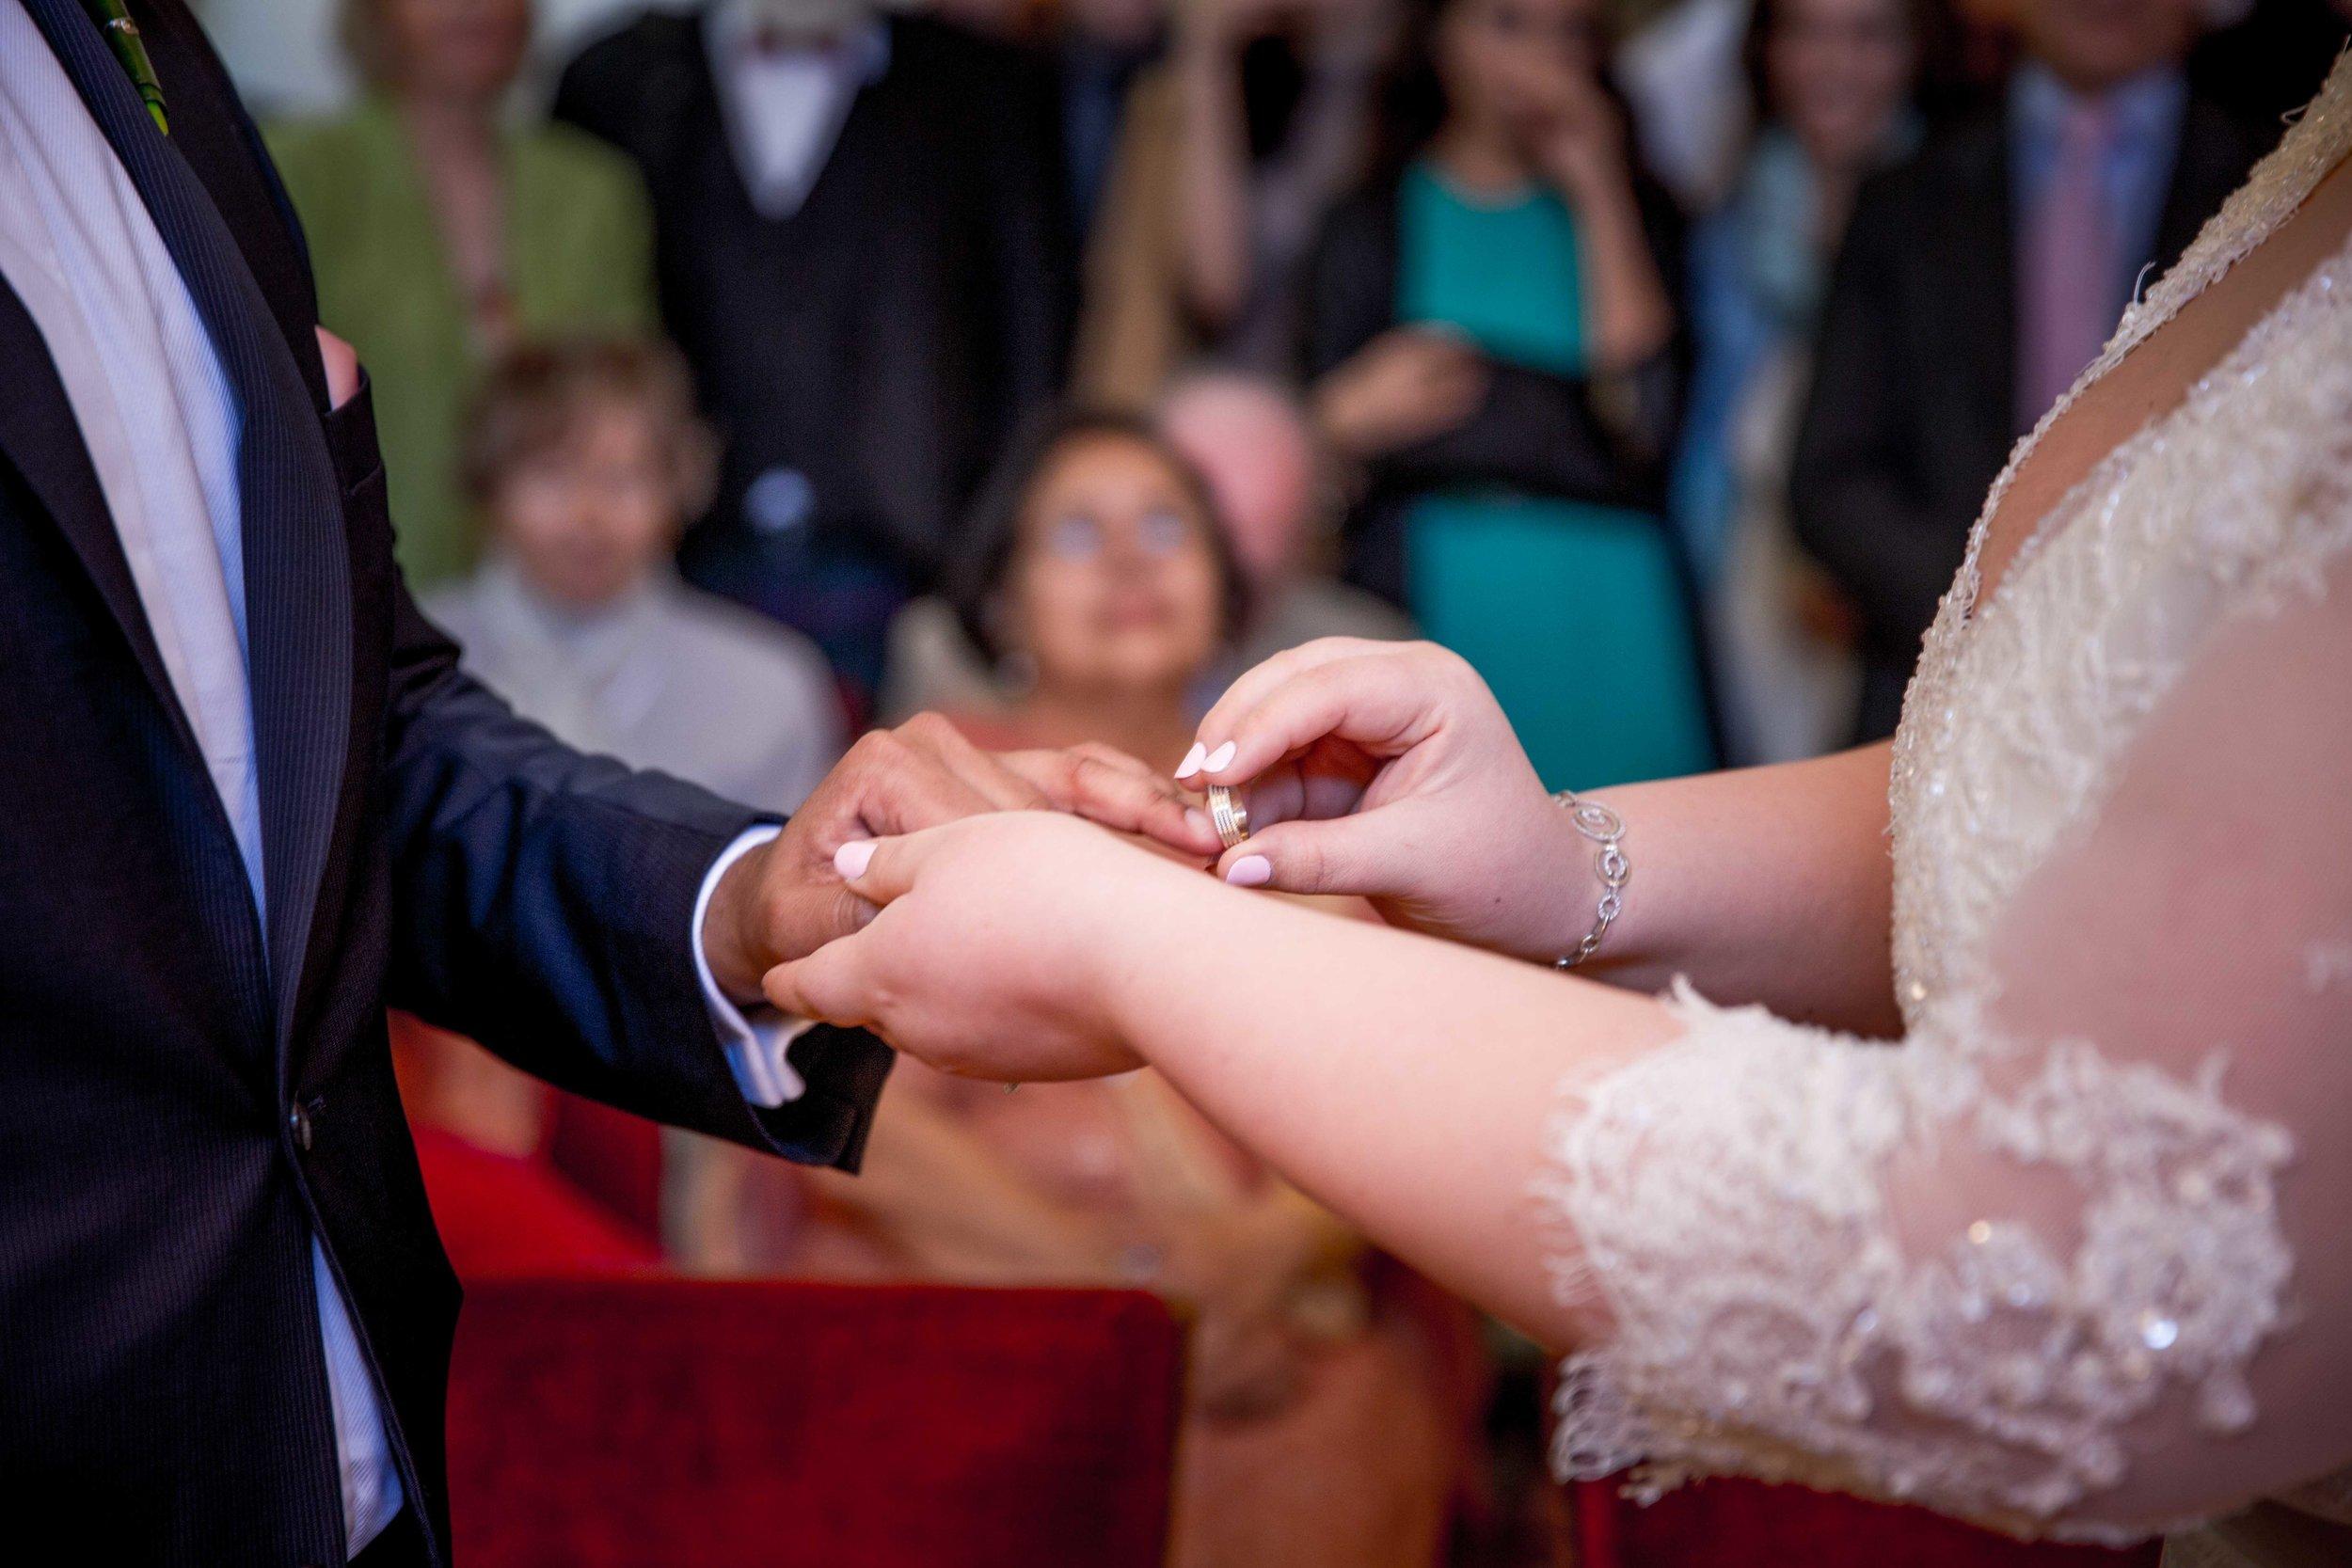 parc-des-eaux-vives-destination-wedding-photographer-geneva-switzerland-natalia-smith-photography-17.jpg